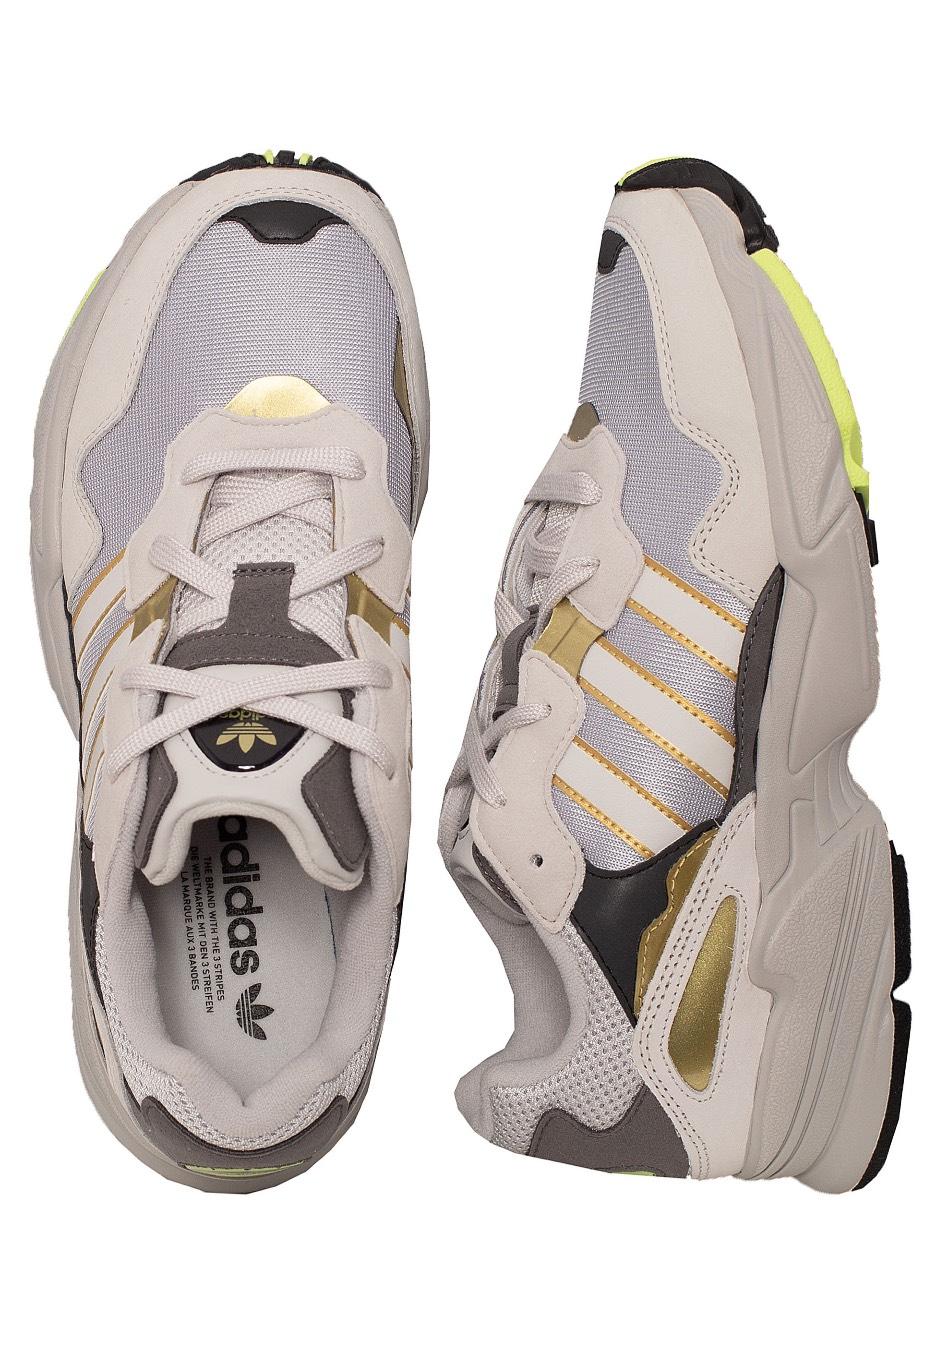 Adidas - Yung-96 Silver Metallic/Grey